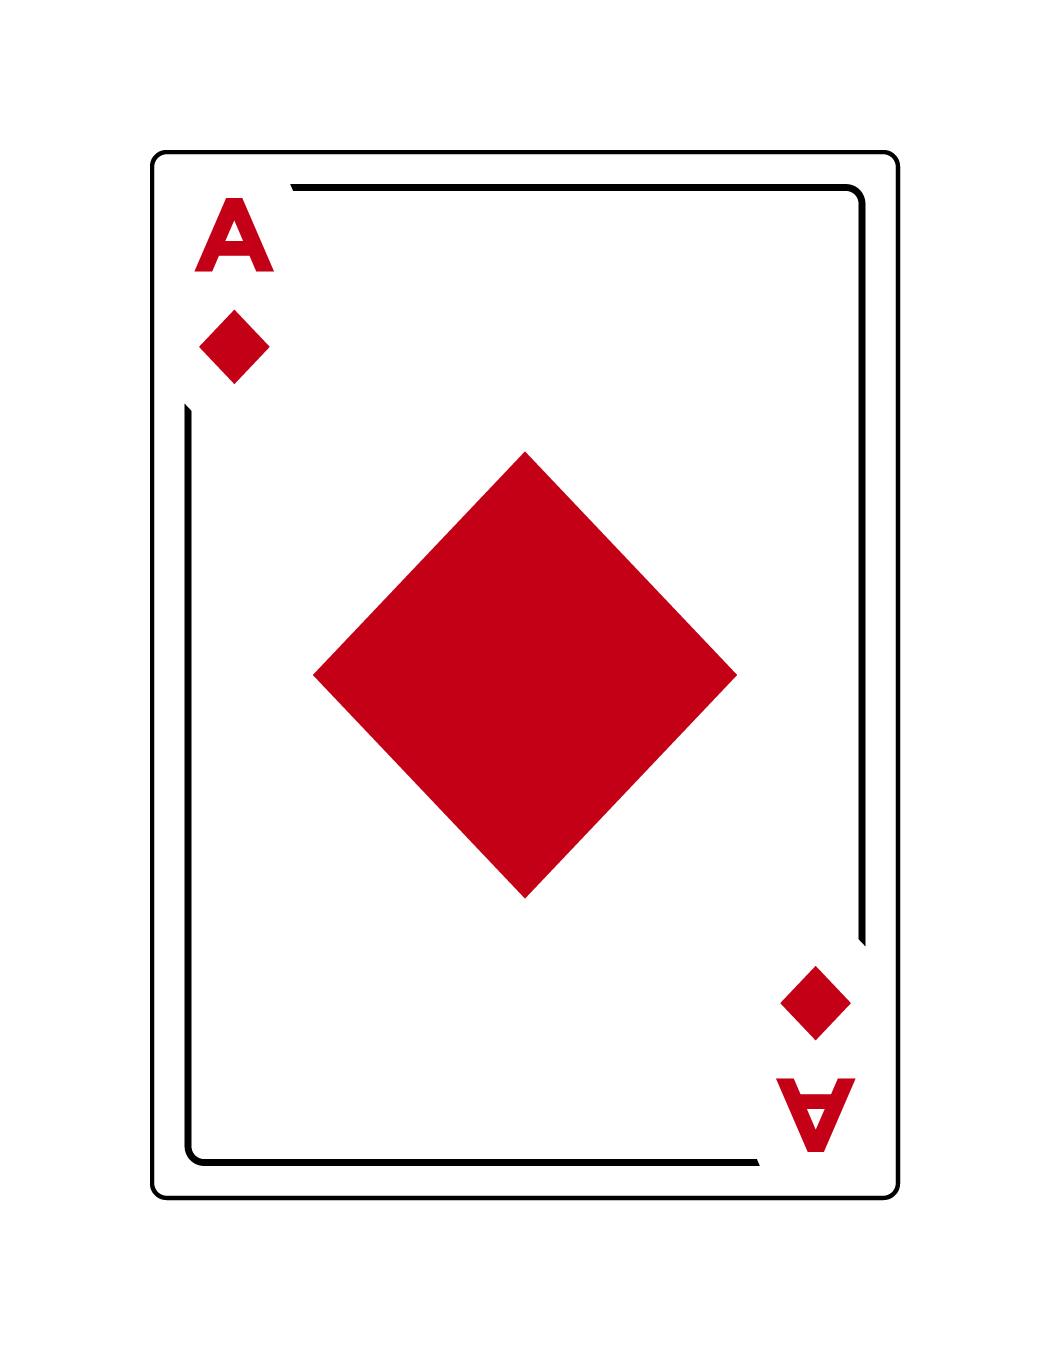 card_draft_1-54.jpg